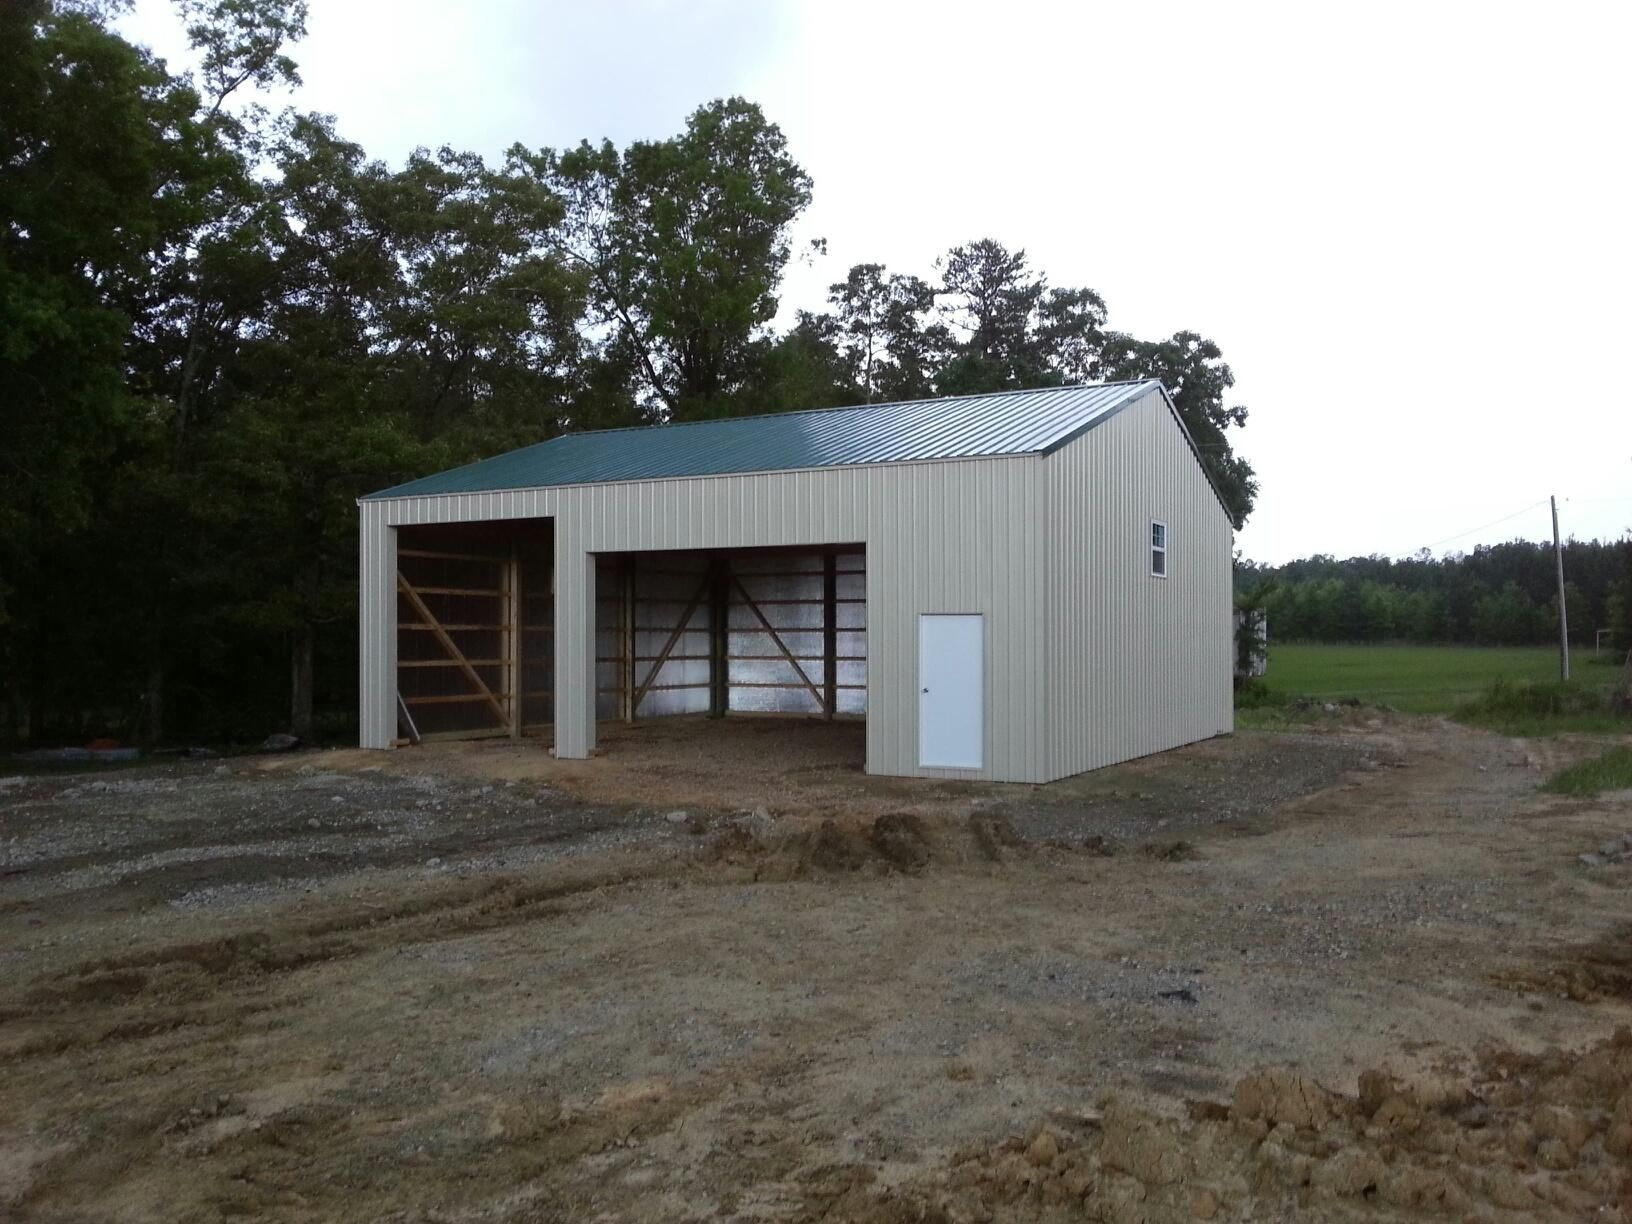 36x40x14 Post Frame Building Www Nationalbarn Com Post Frame Building Diy Pole Barn Shop Buildings